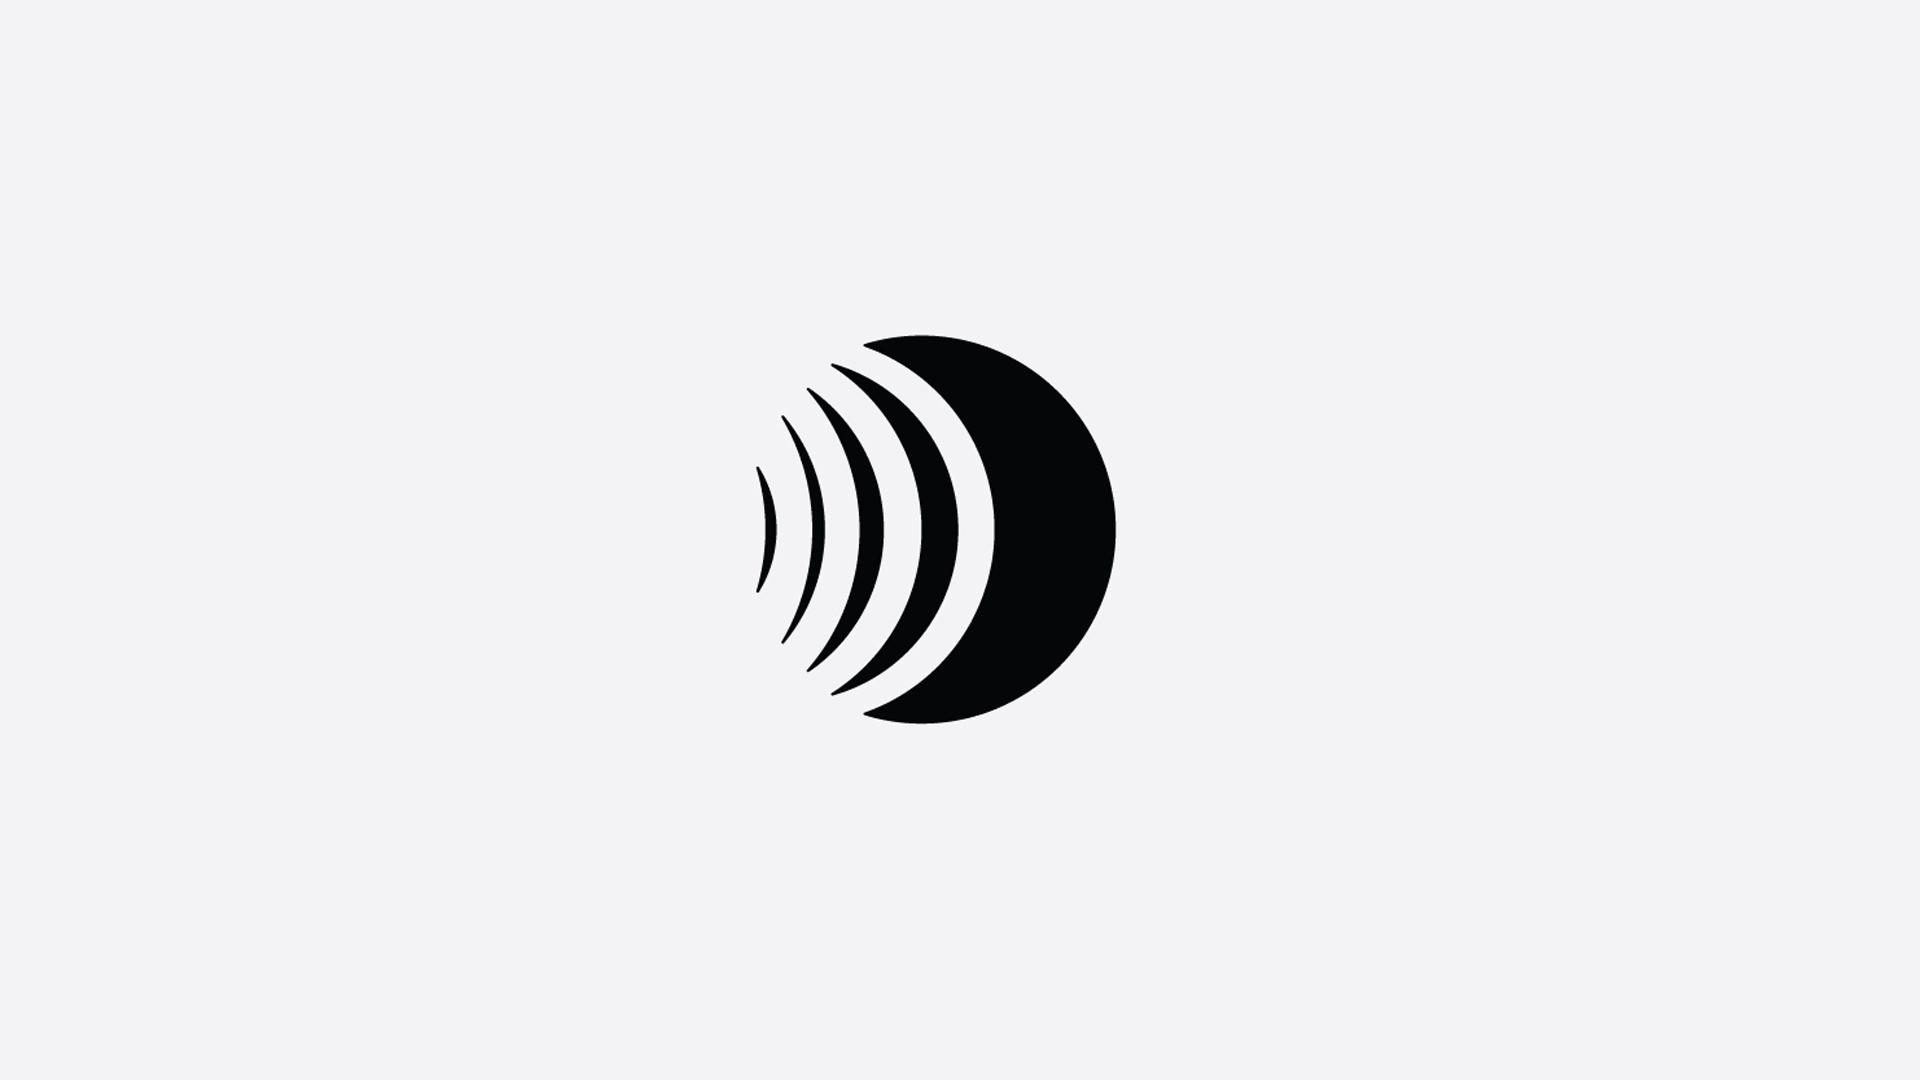 Cover image: Lunar - digital